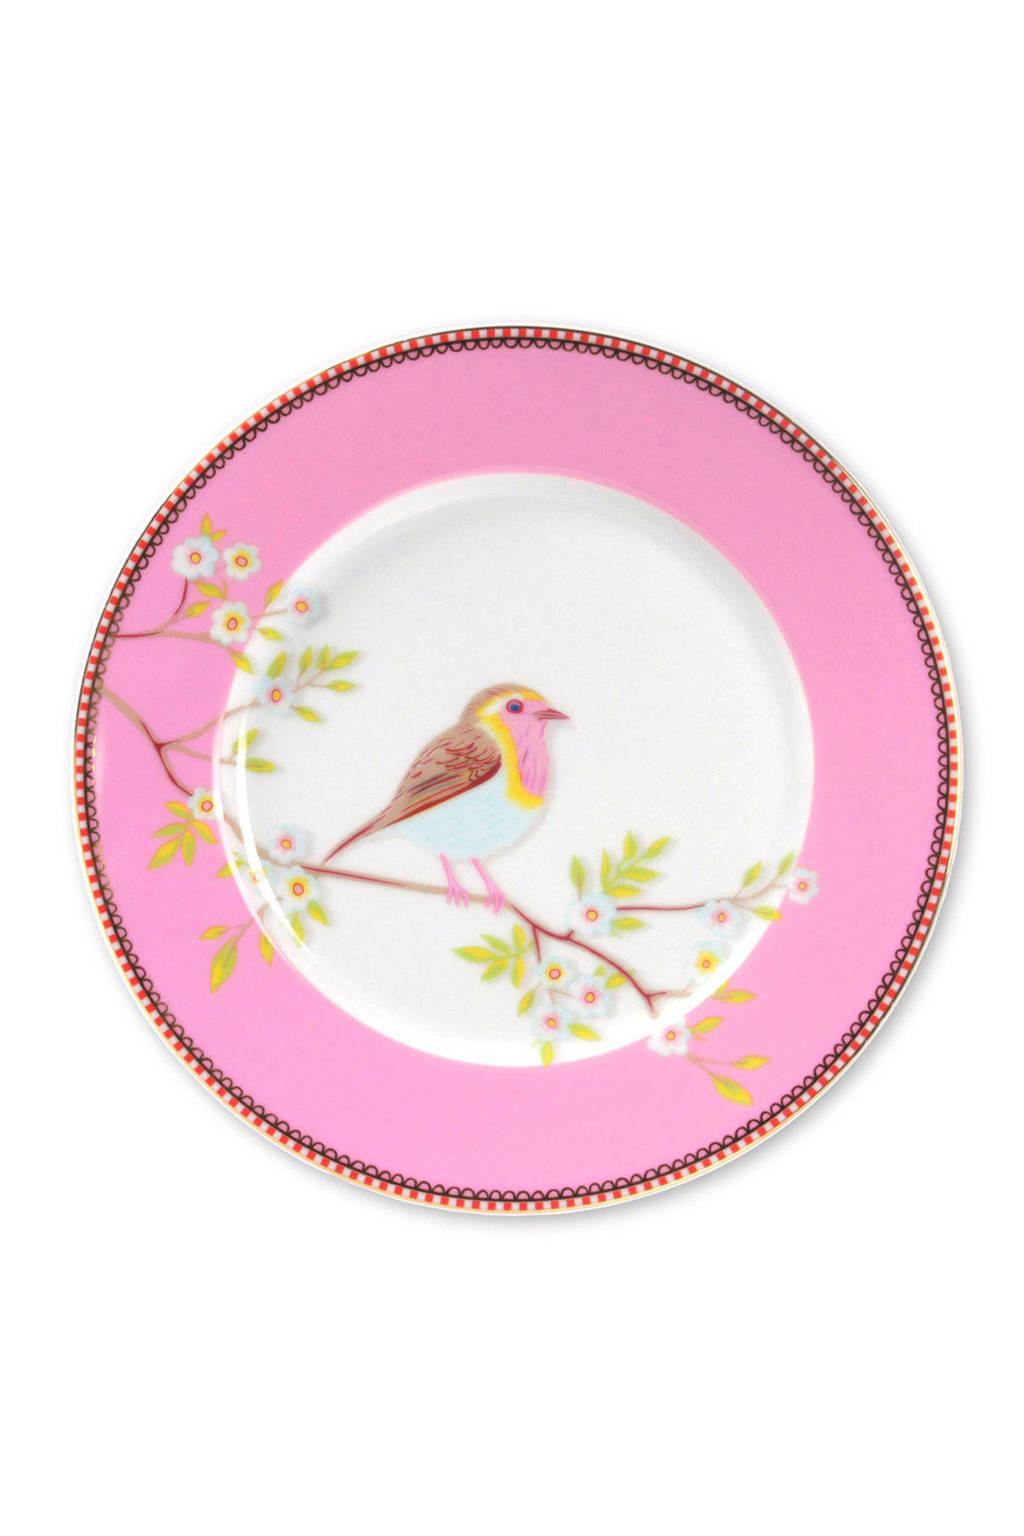 Pip Studio Floral ontbijtbord (Ø21 cm), Roze